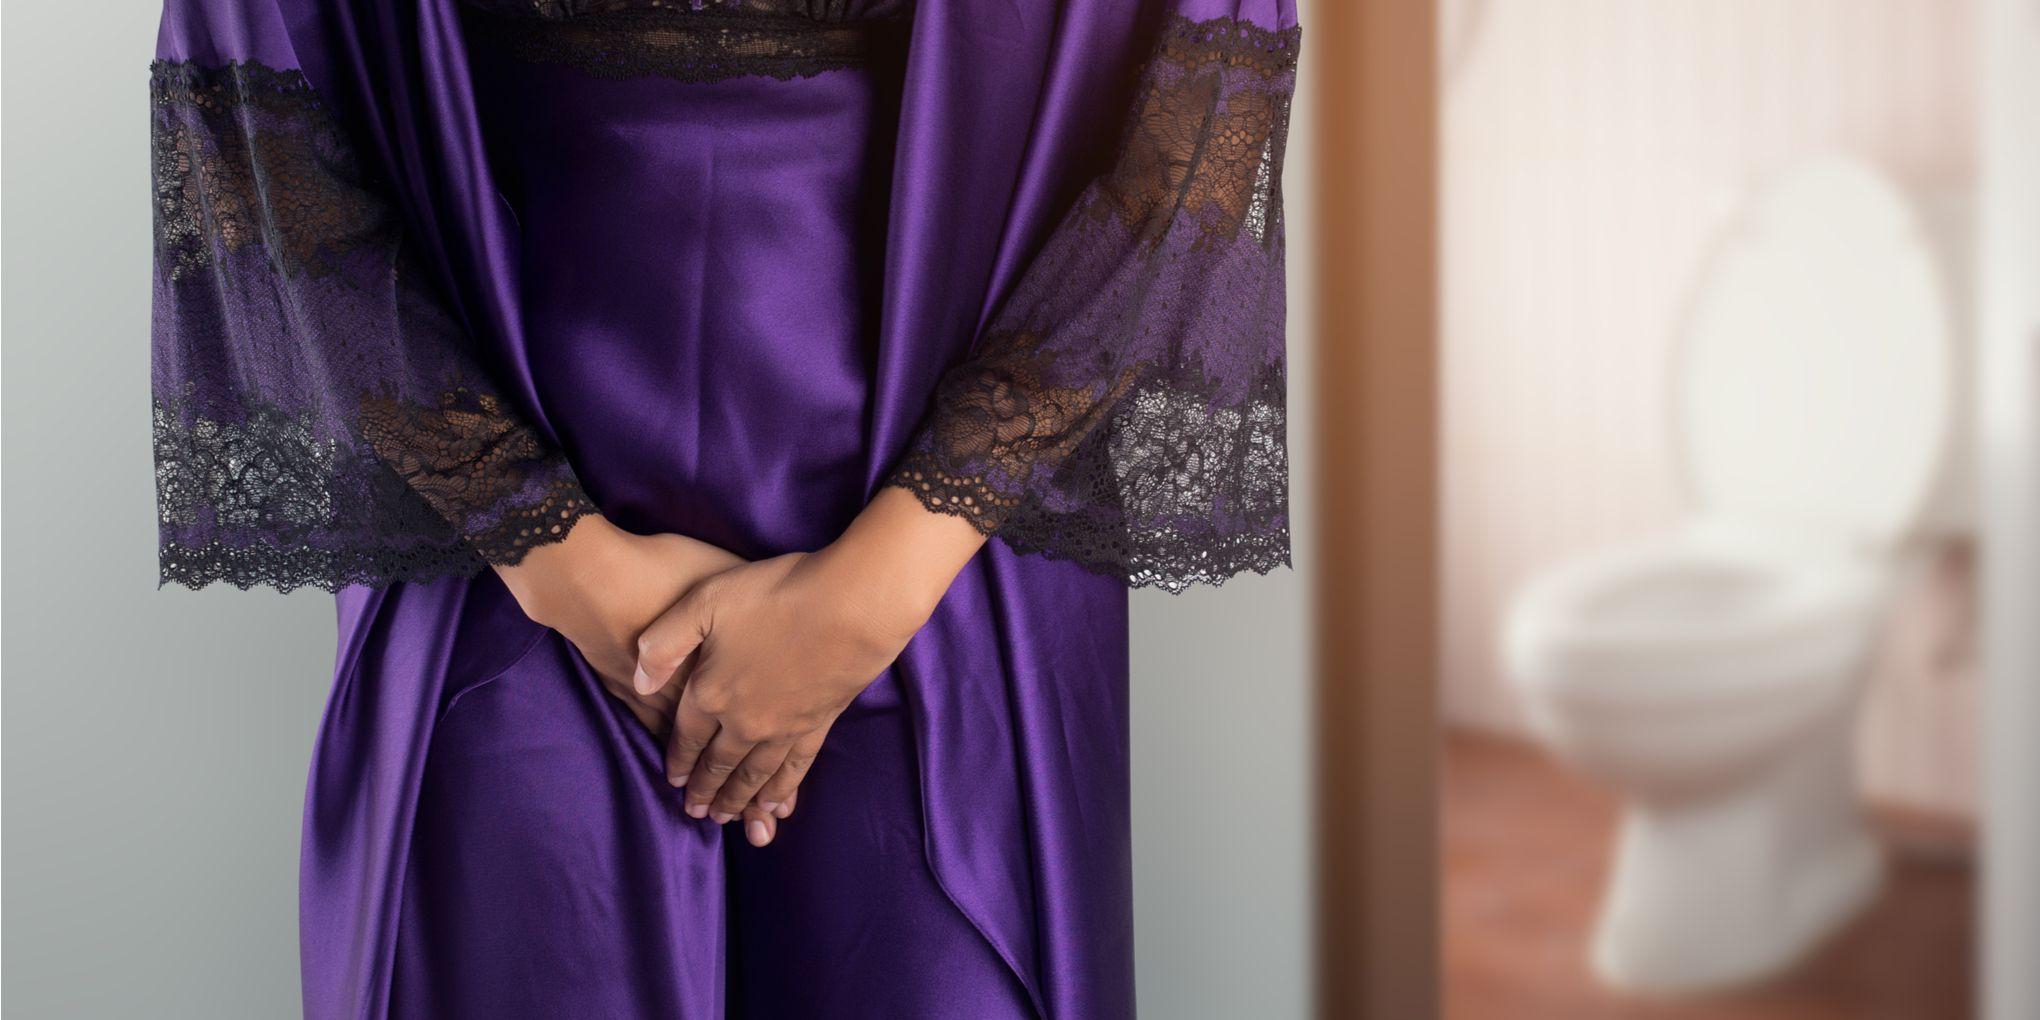 divertikulitis i analni seks djevojke mokri pičke slike